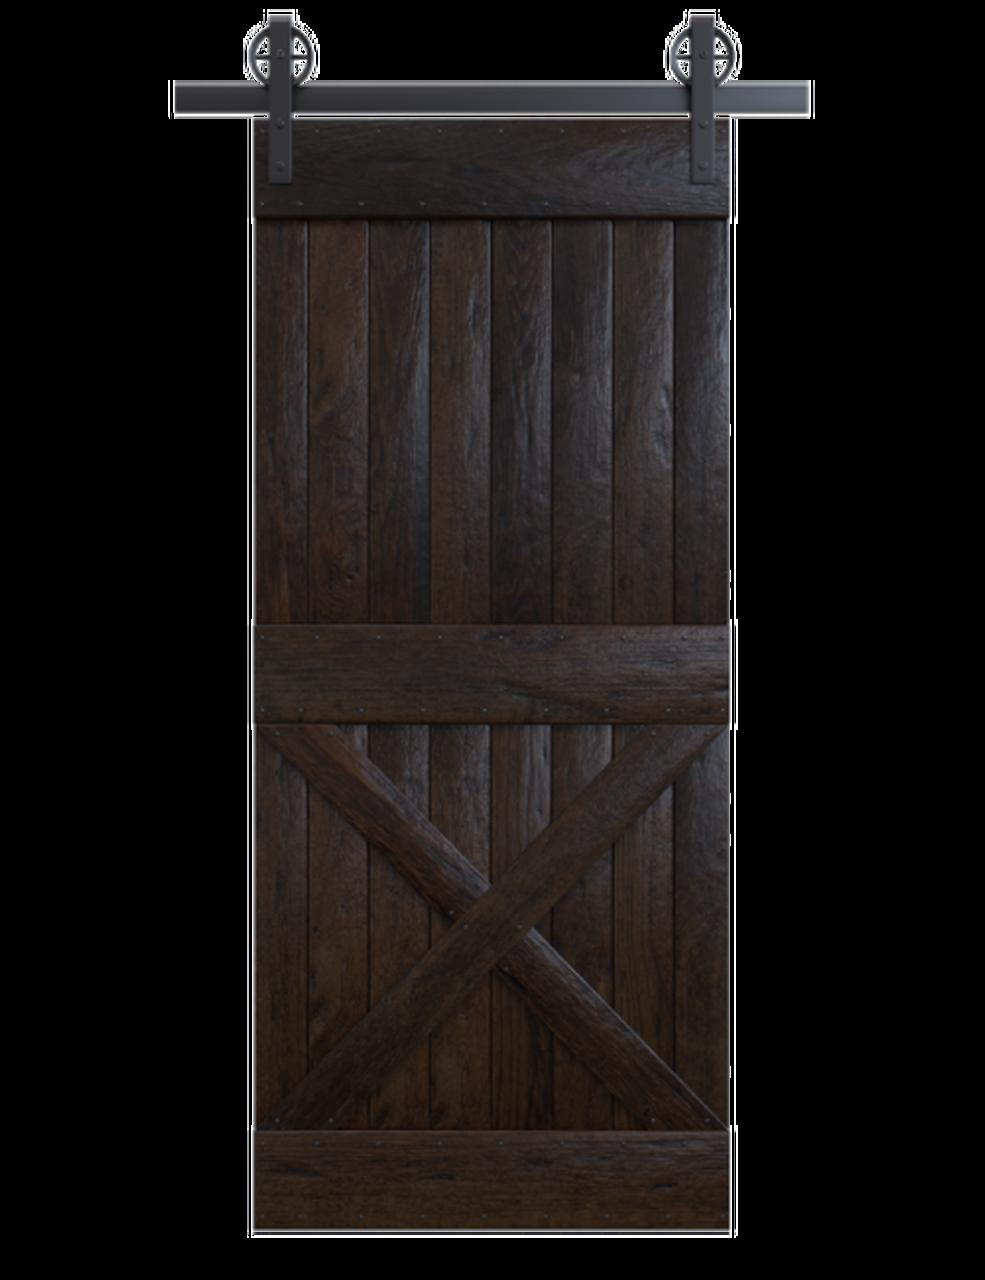 spokane black painted wood half x panel barn door